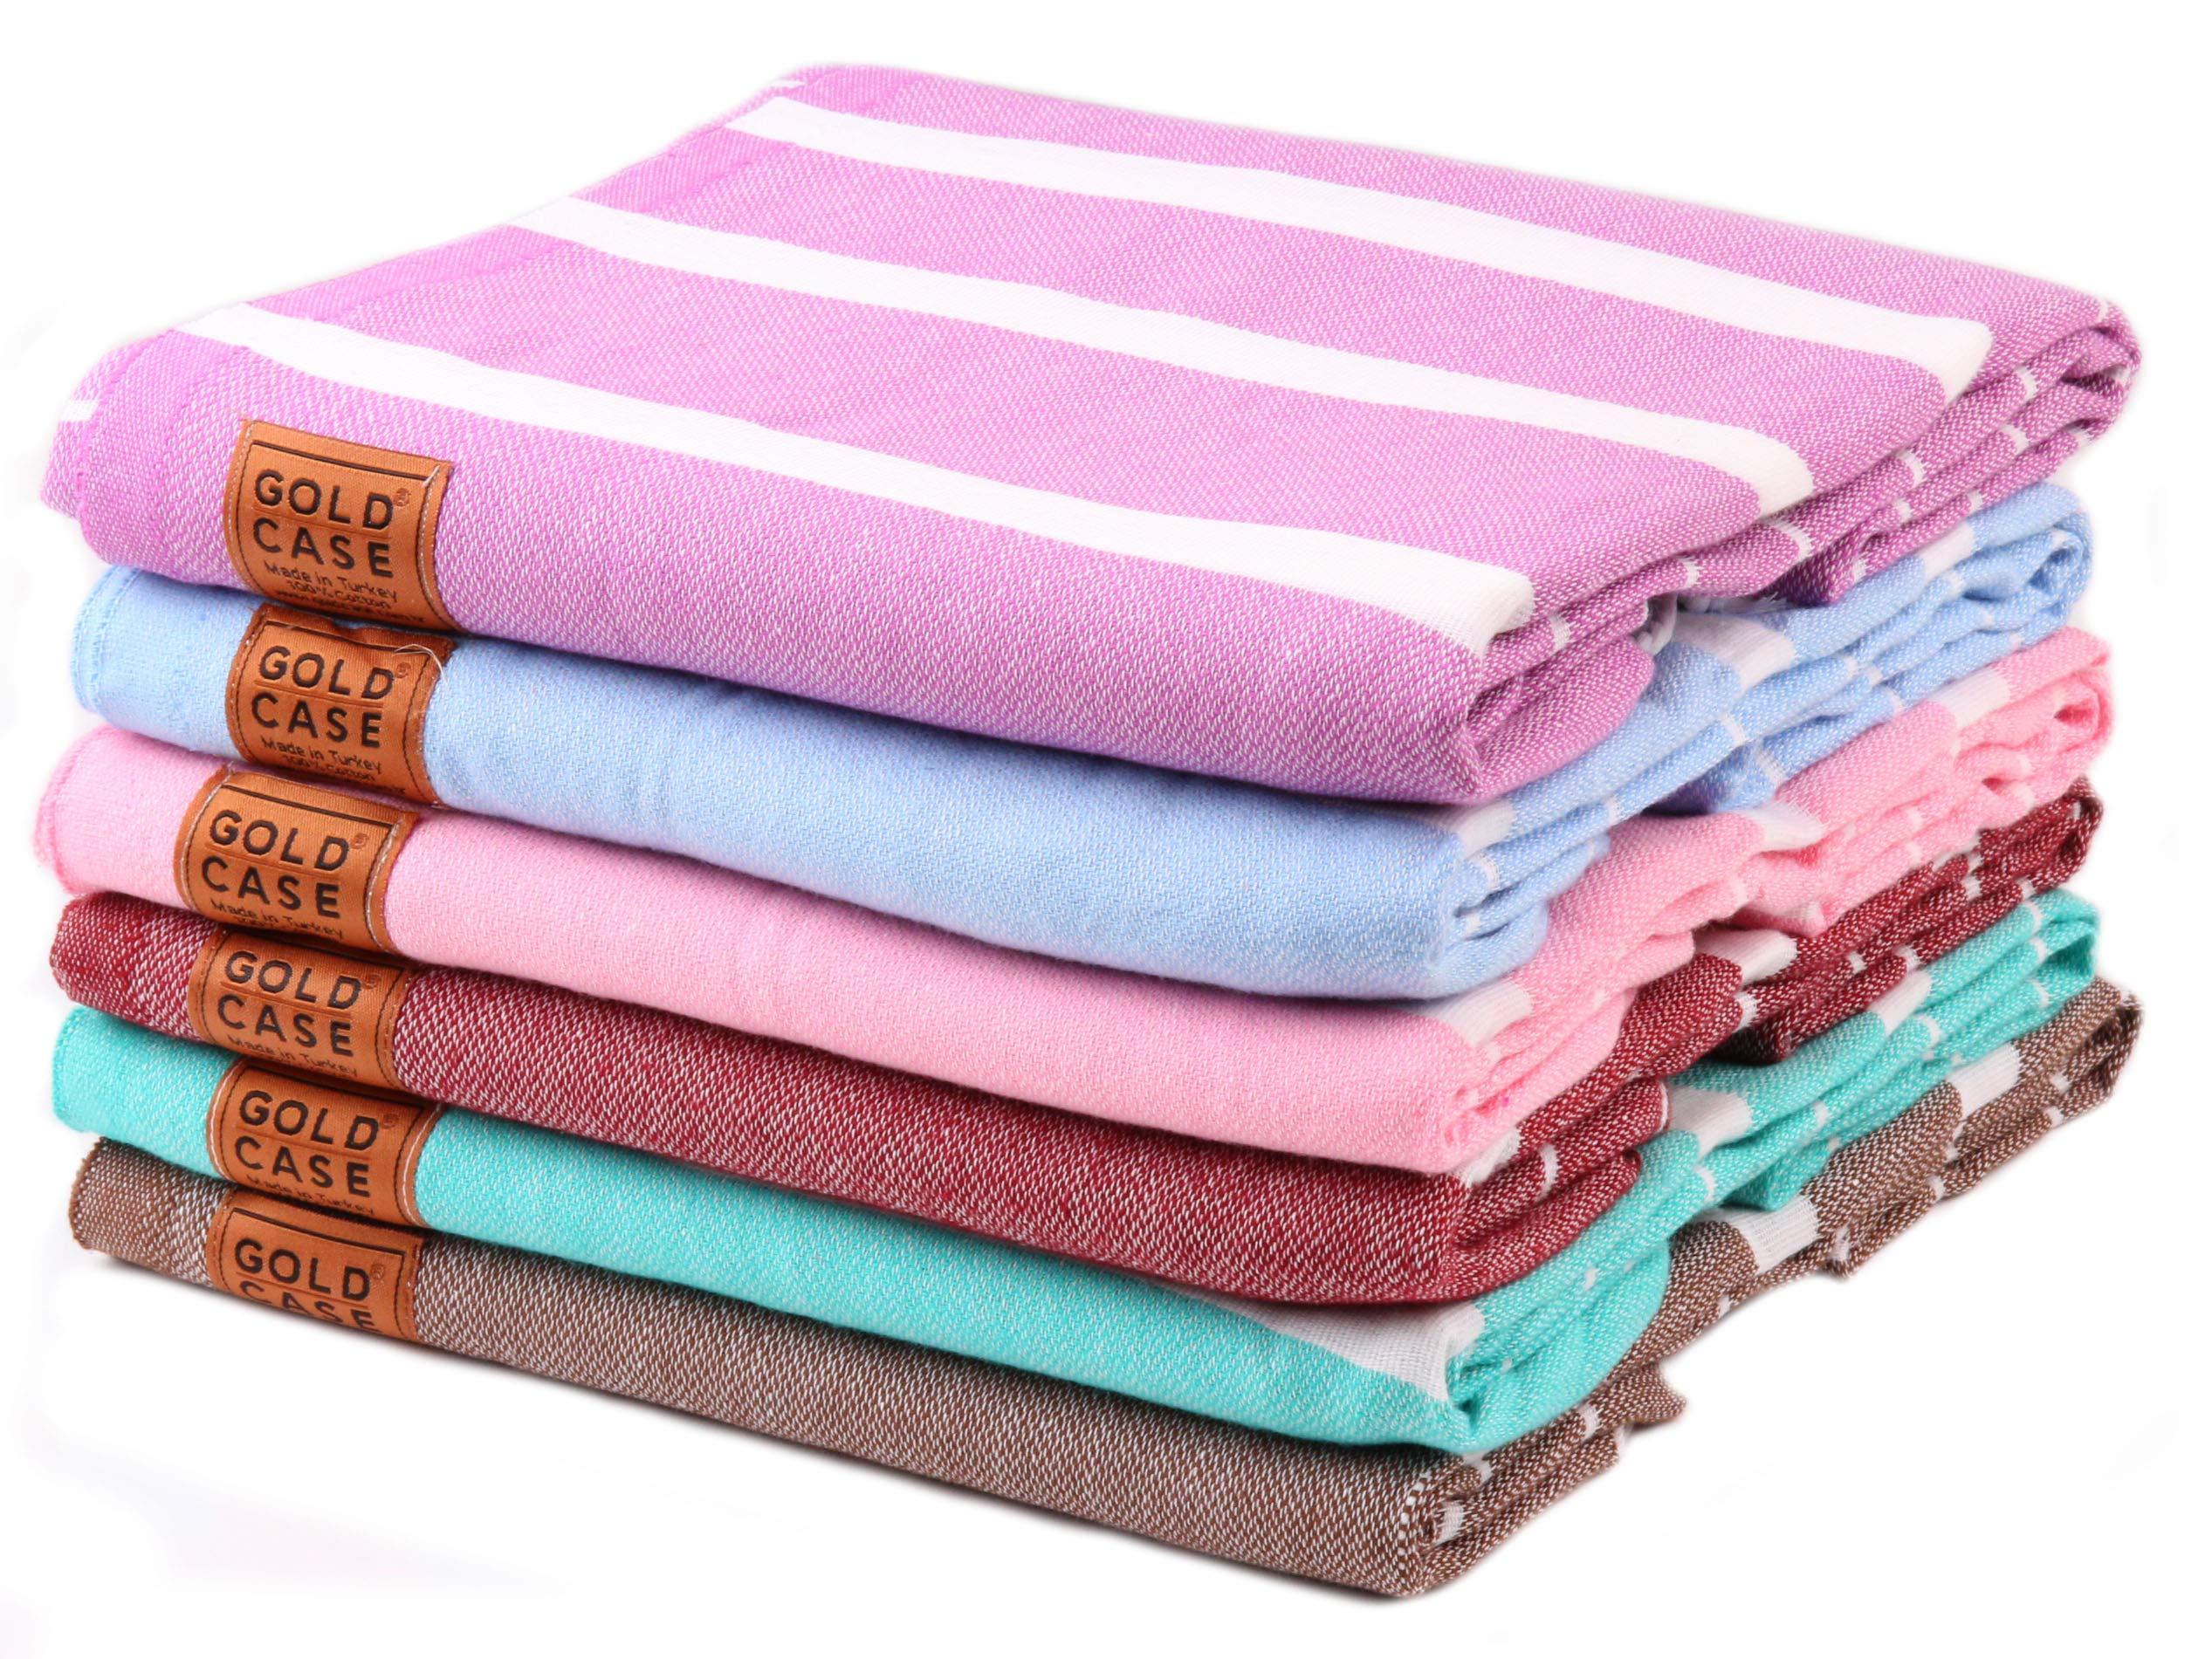 Gold Case Set of 6 XXL Lara Pestemal Towels Turkish Cotton Bath Beach Hammam Towel Peshtemal Throw Blanket (Multicolor2)